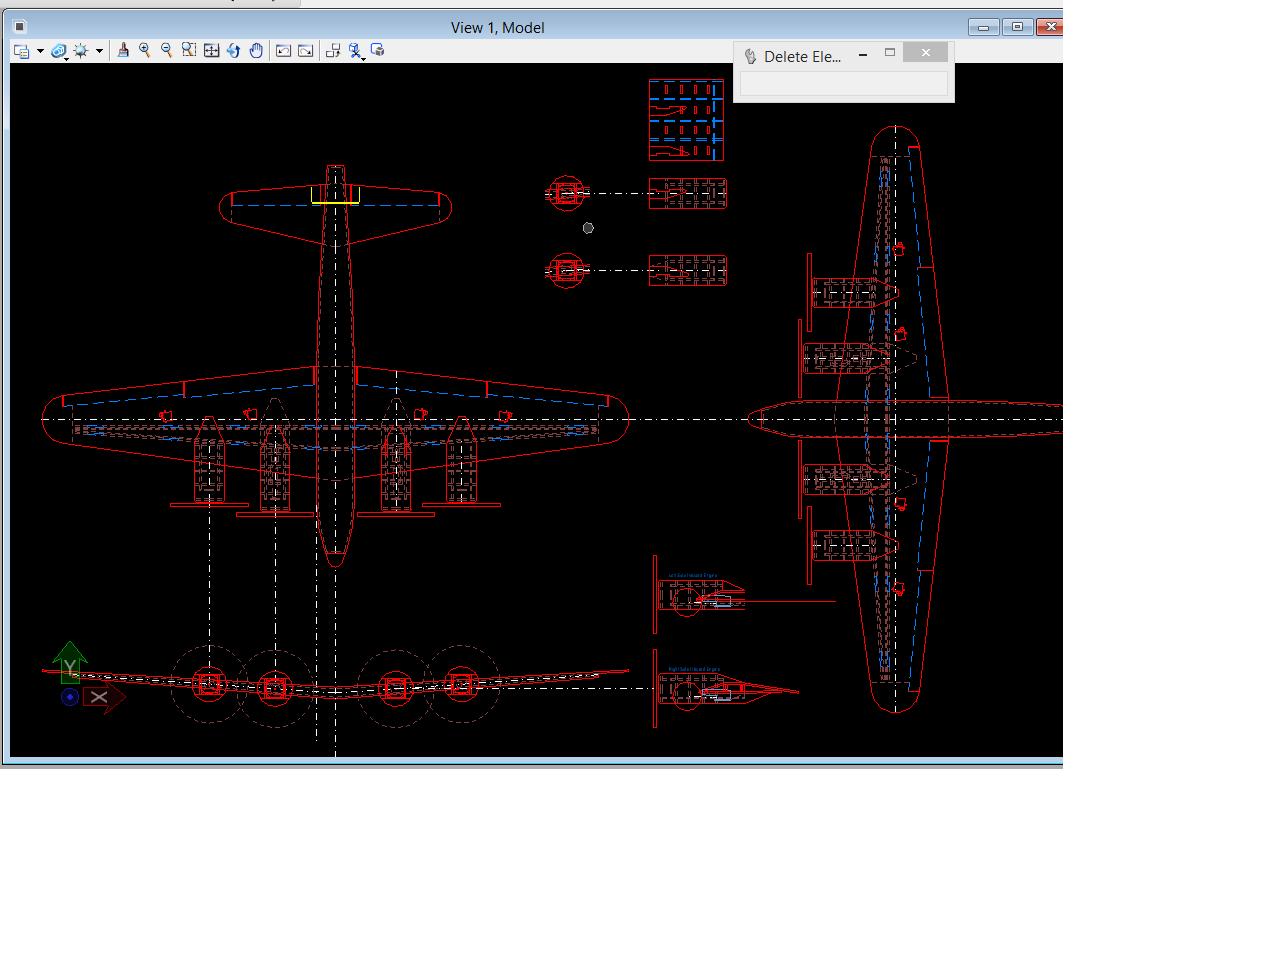 B-17 Plans Restarted | FliteTest Forum on b-17 cutaway view, b-17 manual, b16a block diagram, cyclone diagram, integra radio diagram, b 17 bomber diagram, b16a2 head diagram, b-17 blueprints, b-17 flying fortress, b-17 drawings to scale dwg, b-24 diagram, b-17 pencil drawings, b-29 superfortress bomber diagram, 91 integra hoses diagram, 93 honda civic obd diagnosis diagram, b-17 production, b-17 engines and superchargers, 2004 toyota tacoma stereo wiring diagram, 95 accord radio harness diagram,